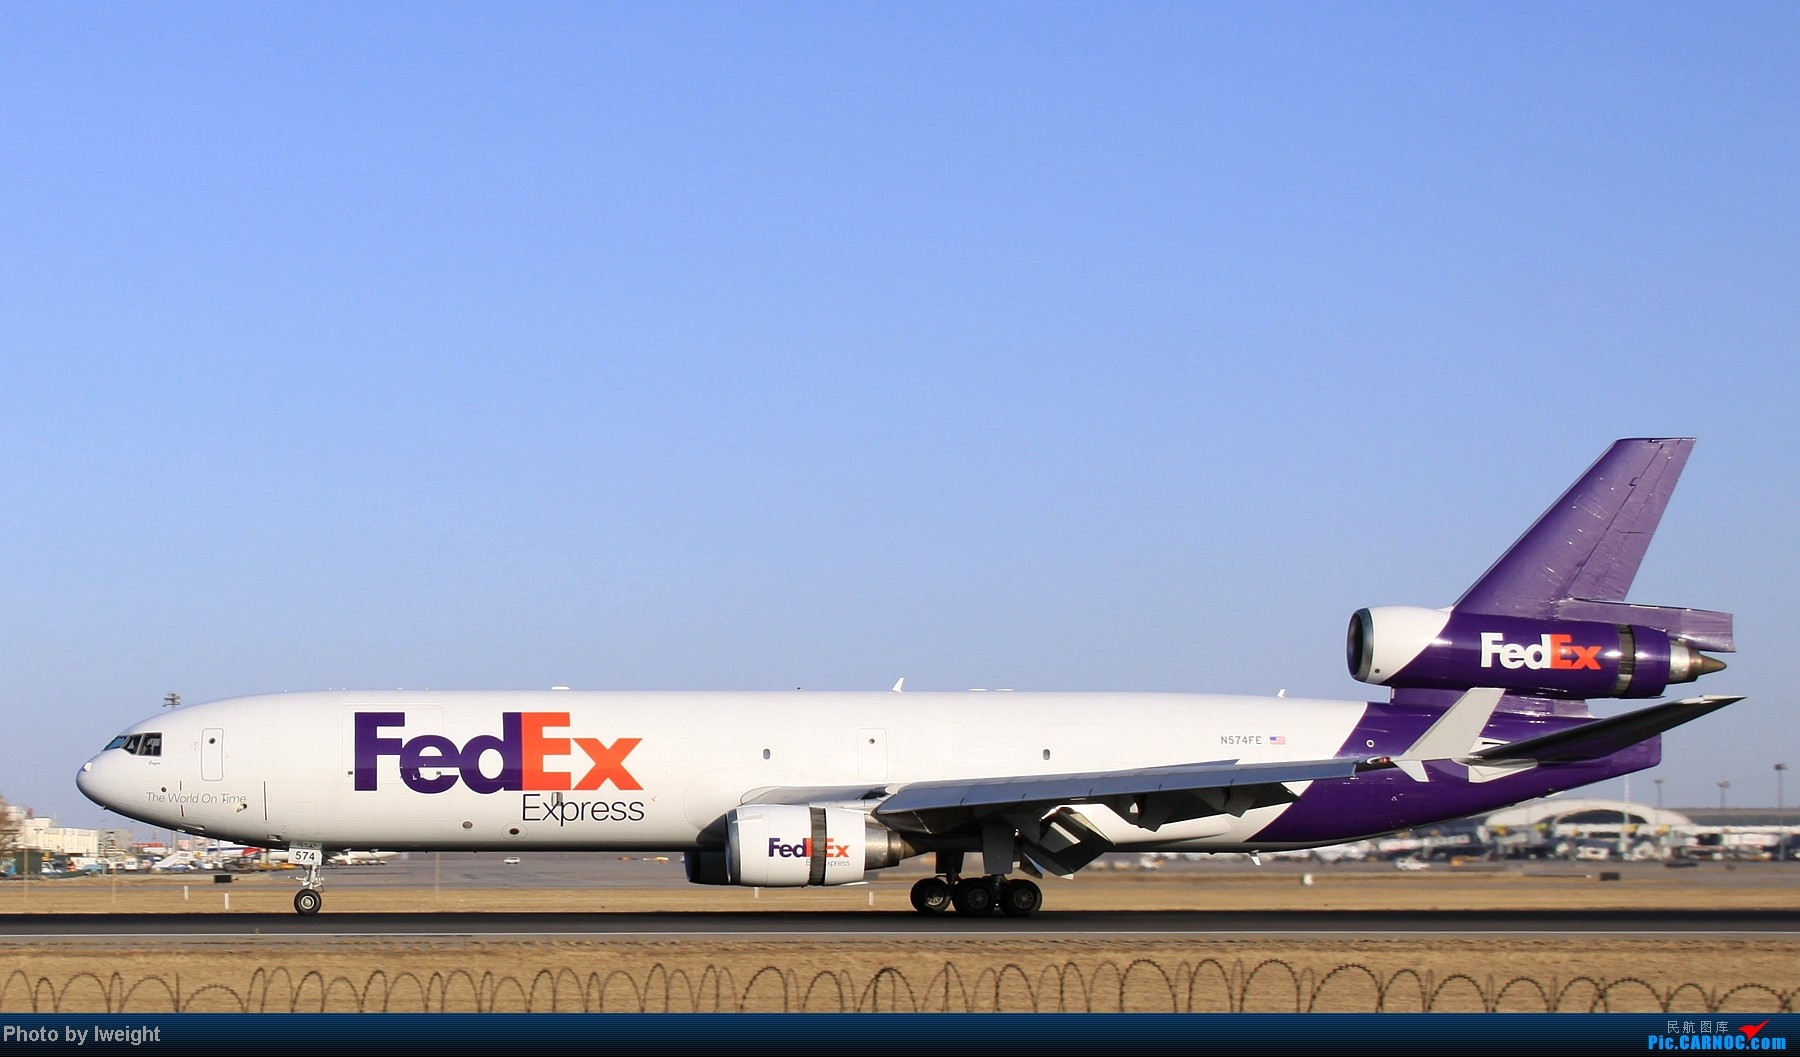 Re:[原创]春节期间首都机场拍机汇报 MCDONNELL DOUGLAS MD-11 N574FE 中国北京首都机场